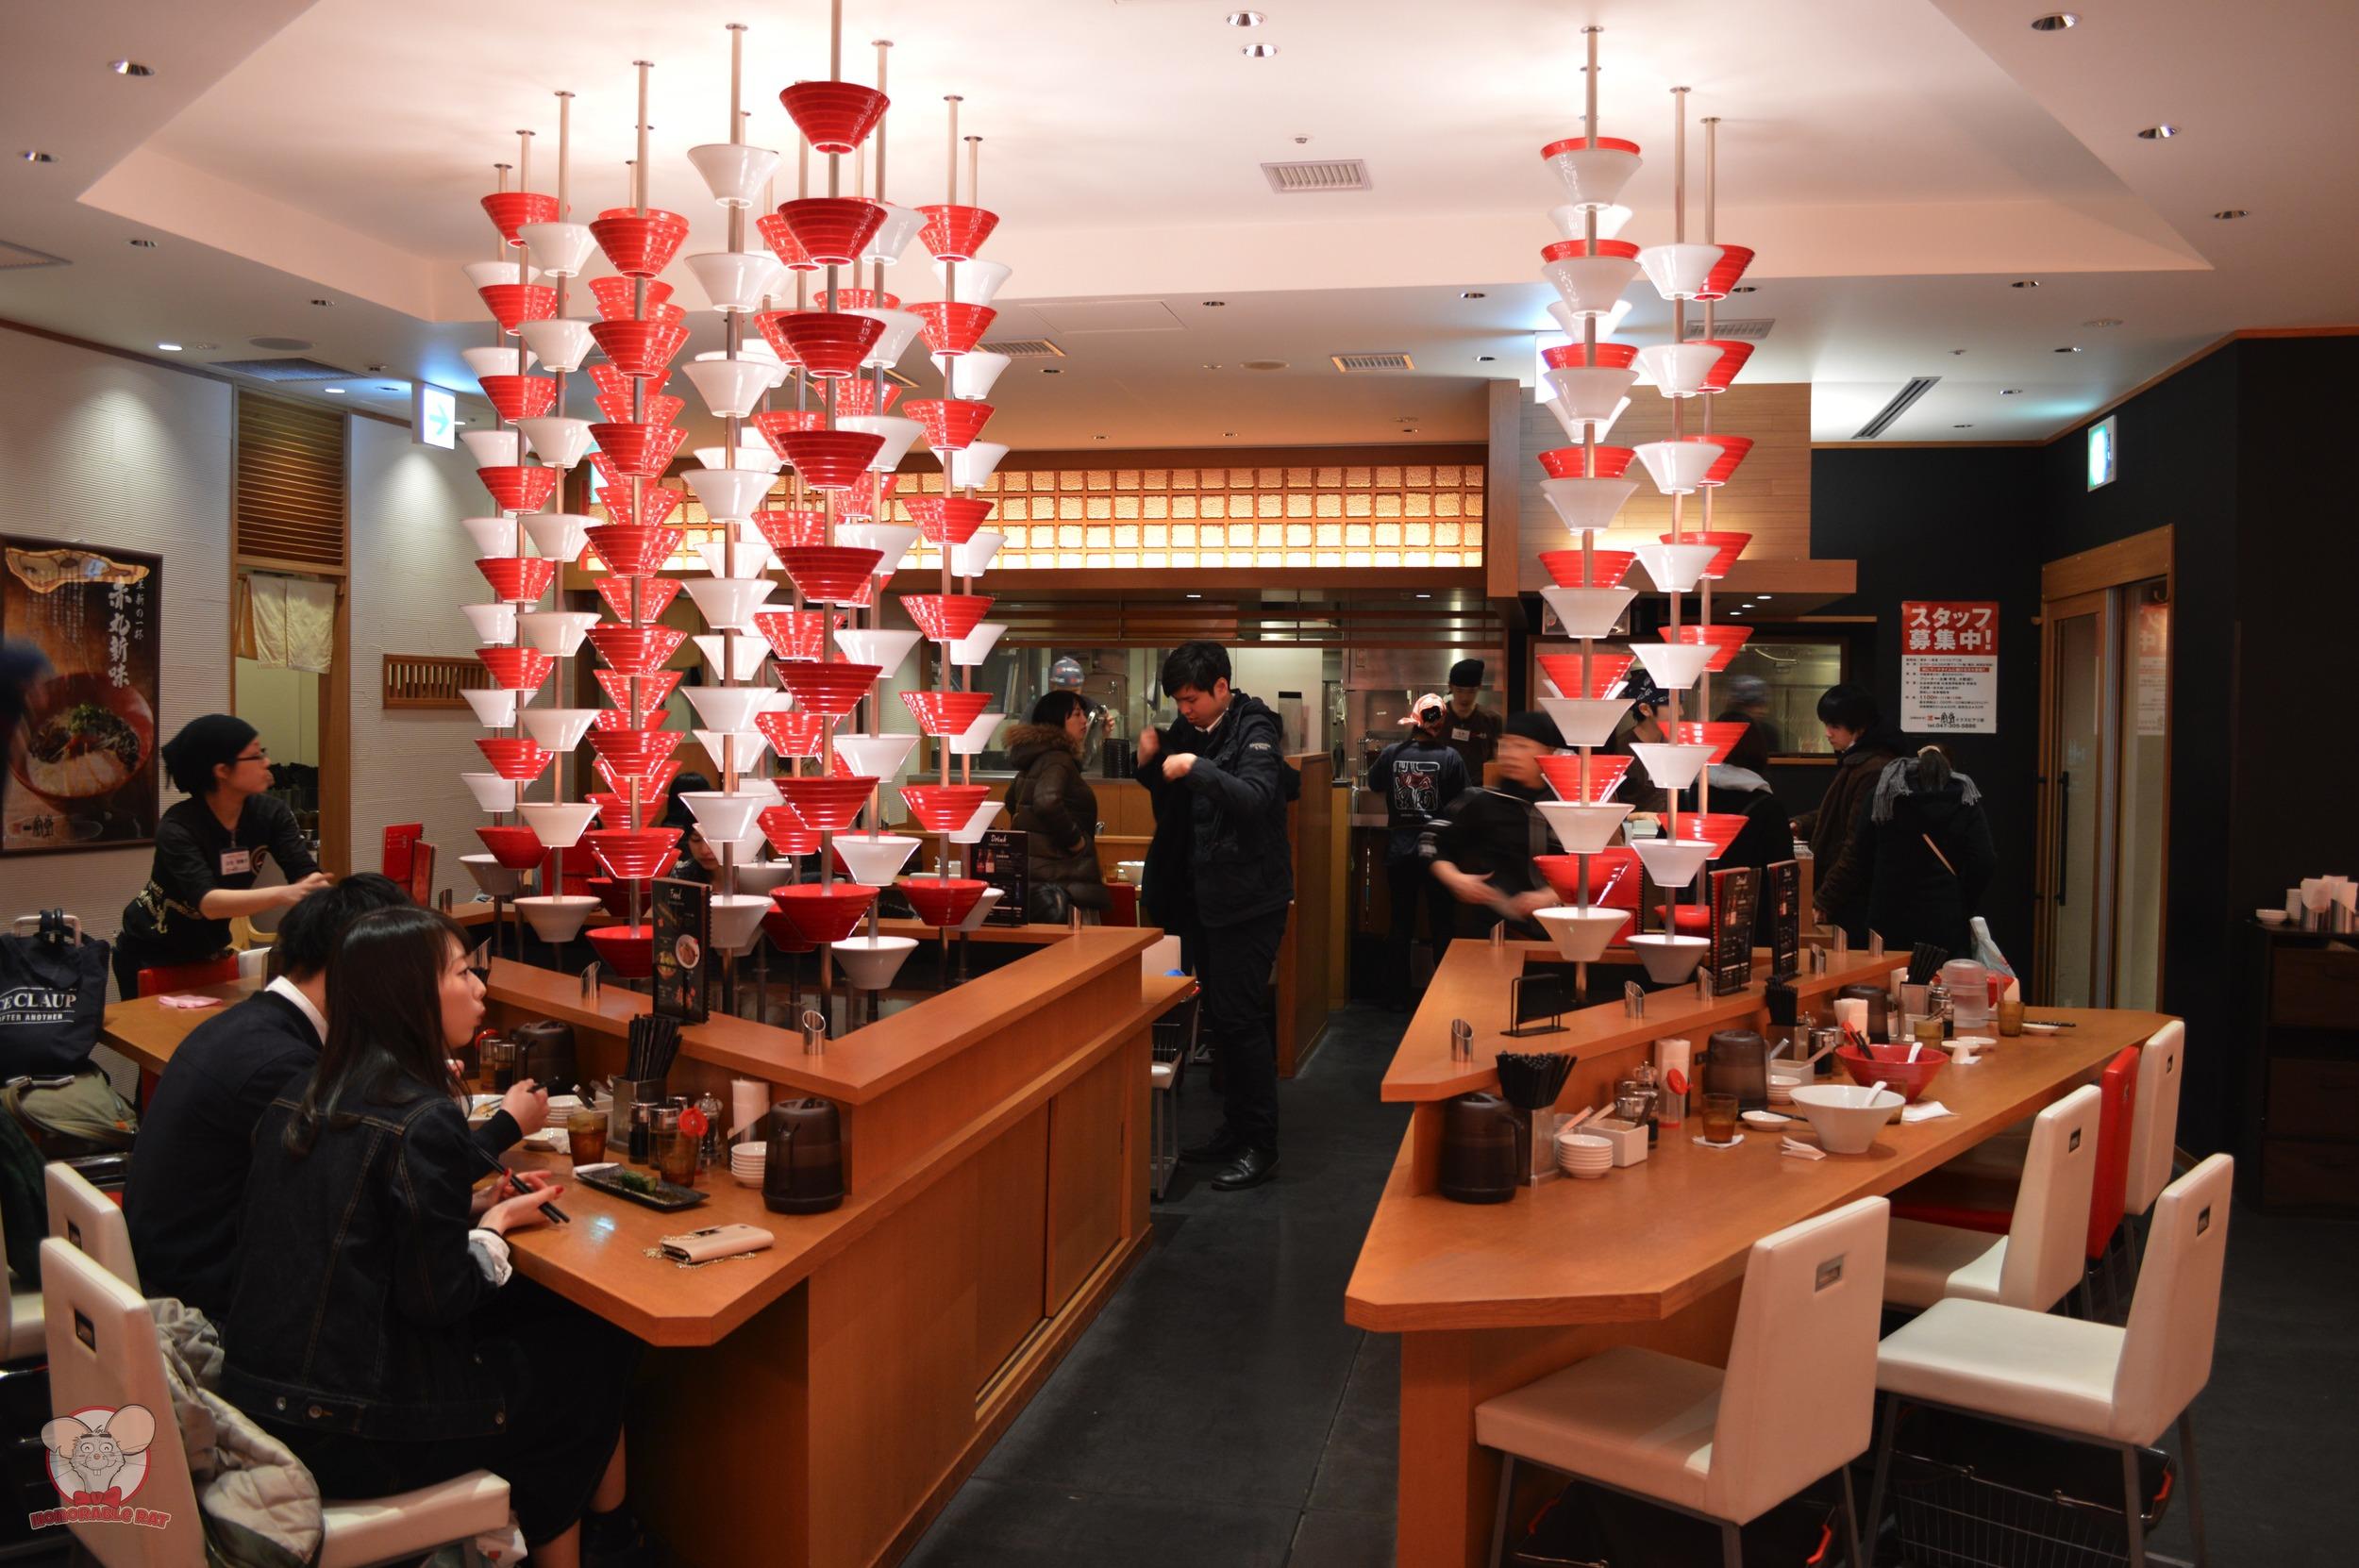 Ippudo Ramen seating arrangement